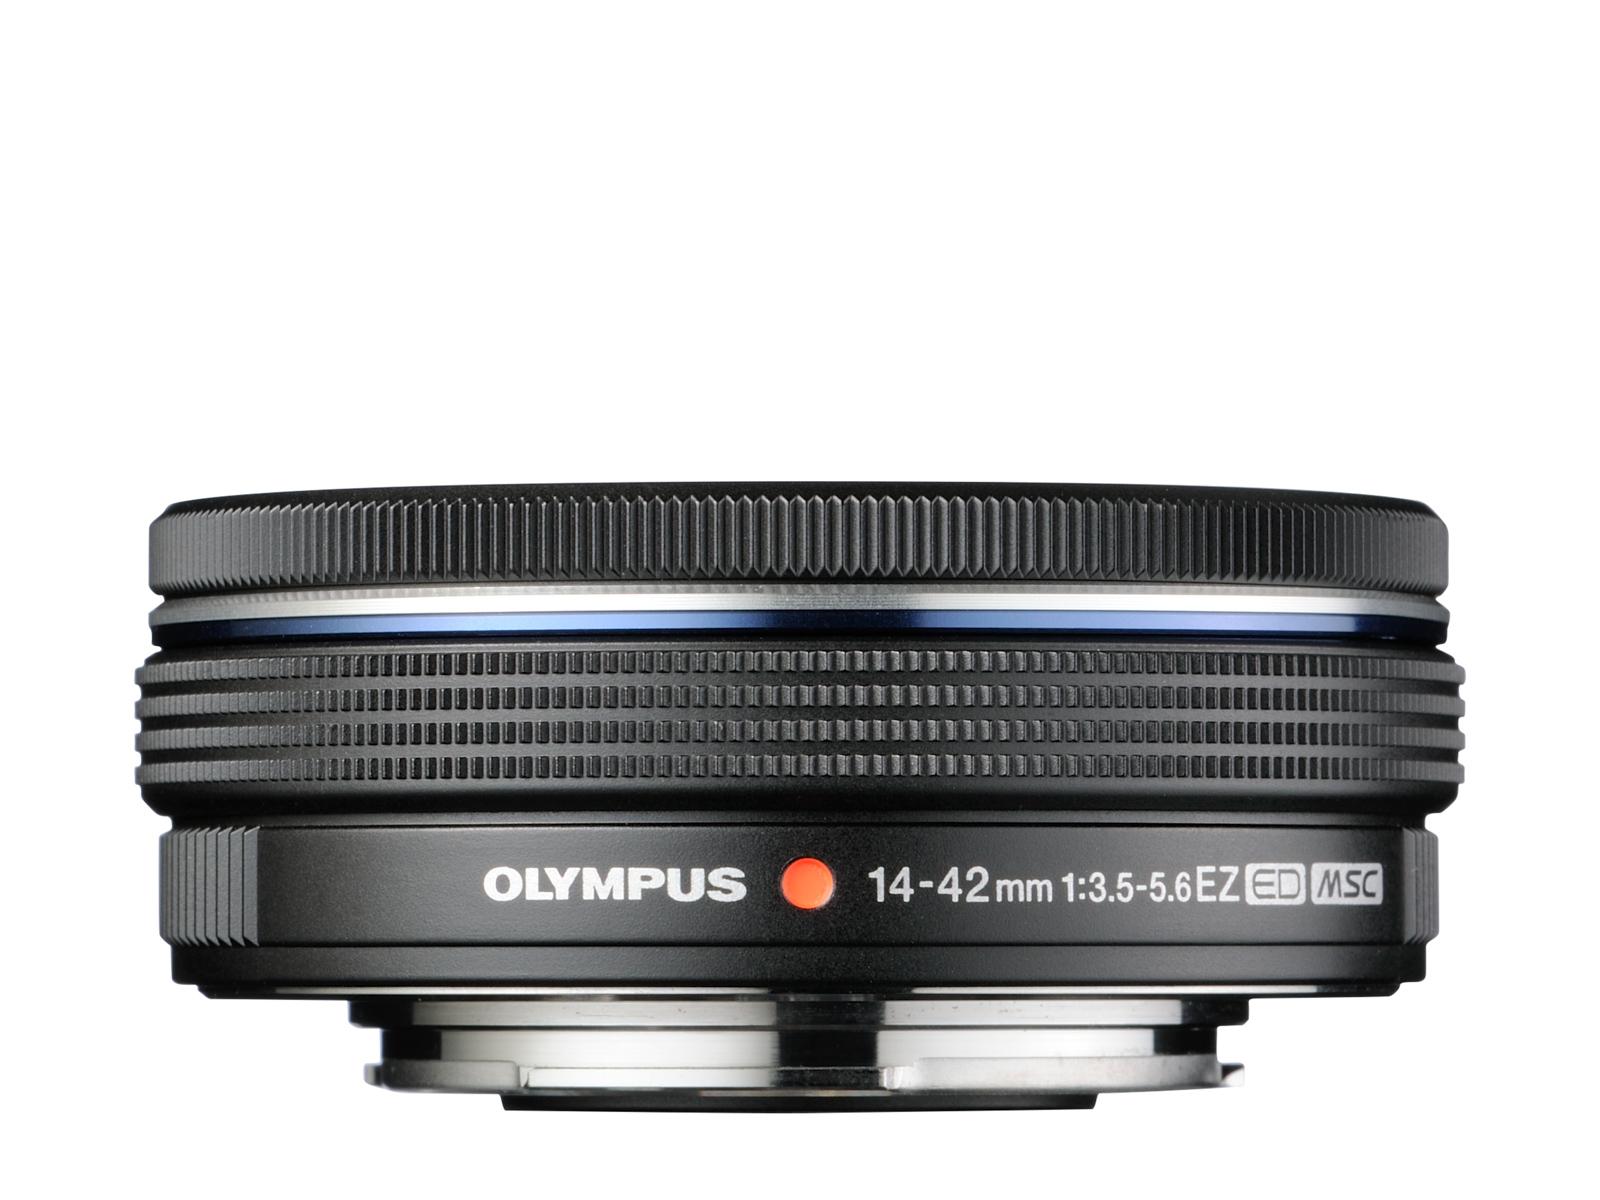 Olympus M.Zuiko ED 14‑42mm F3.5‑5.6 EZ Pancake